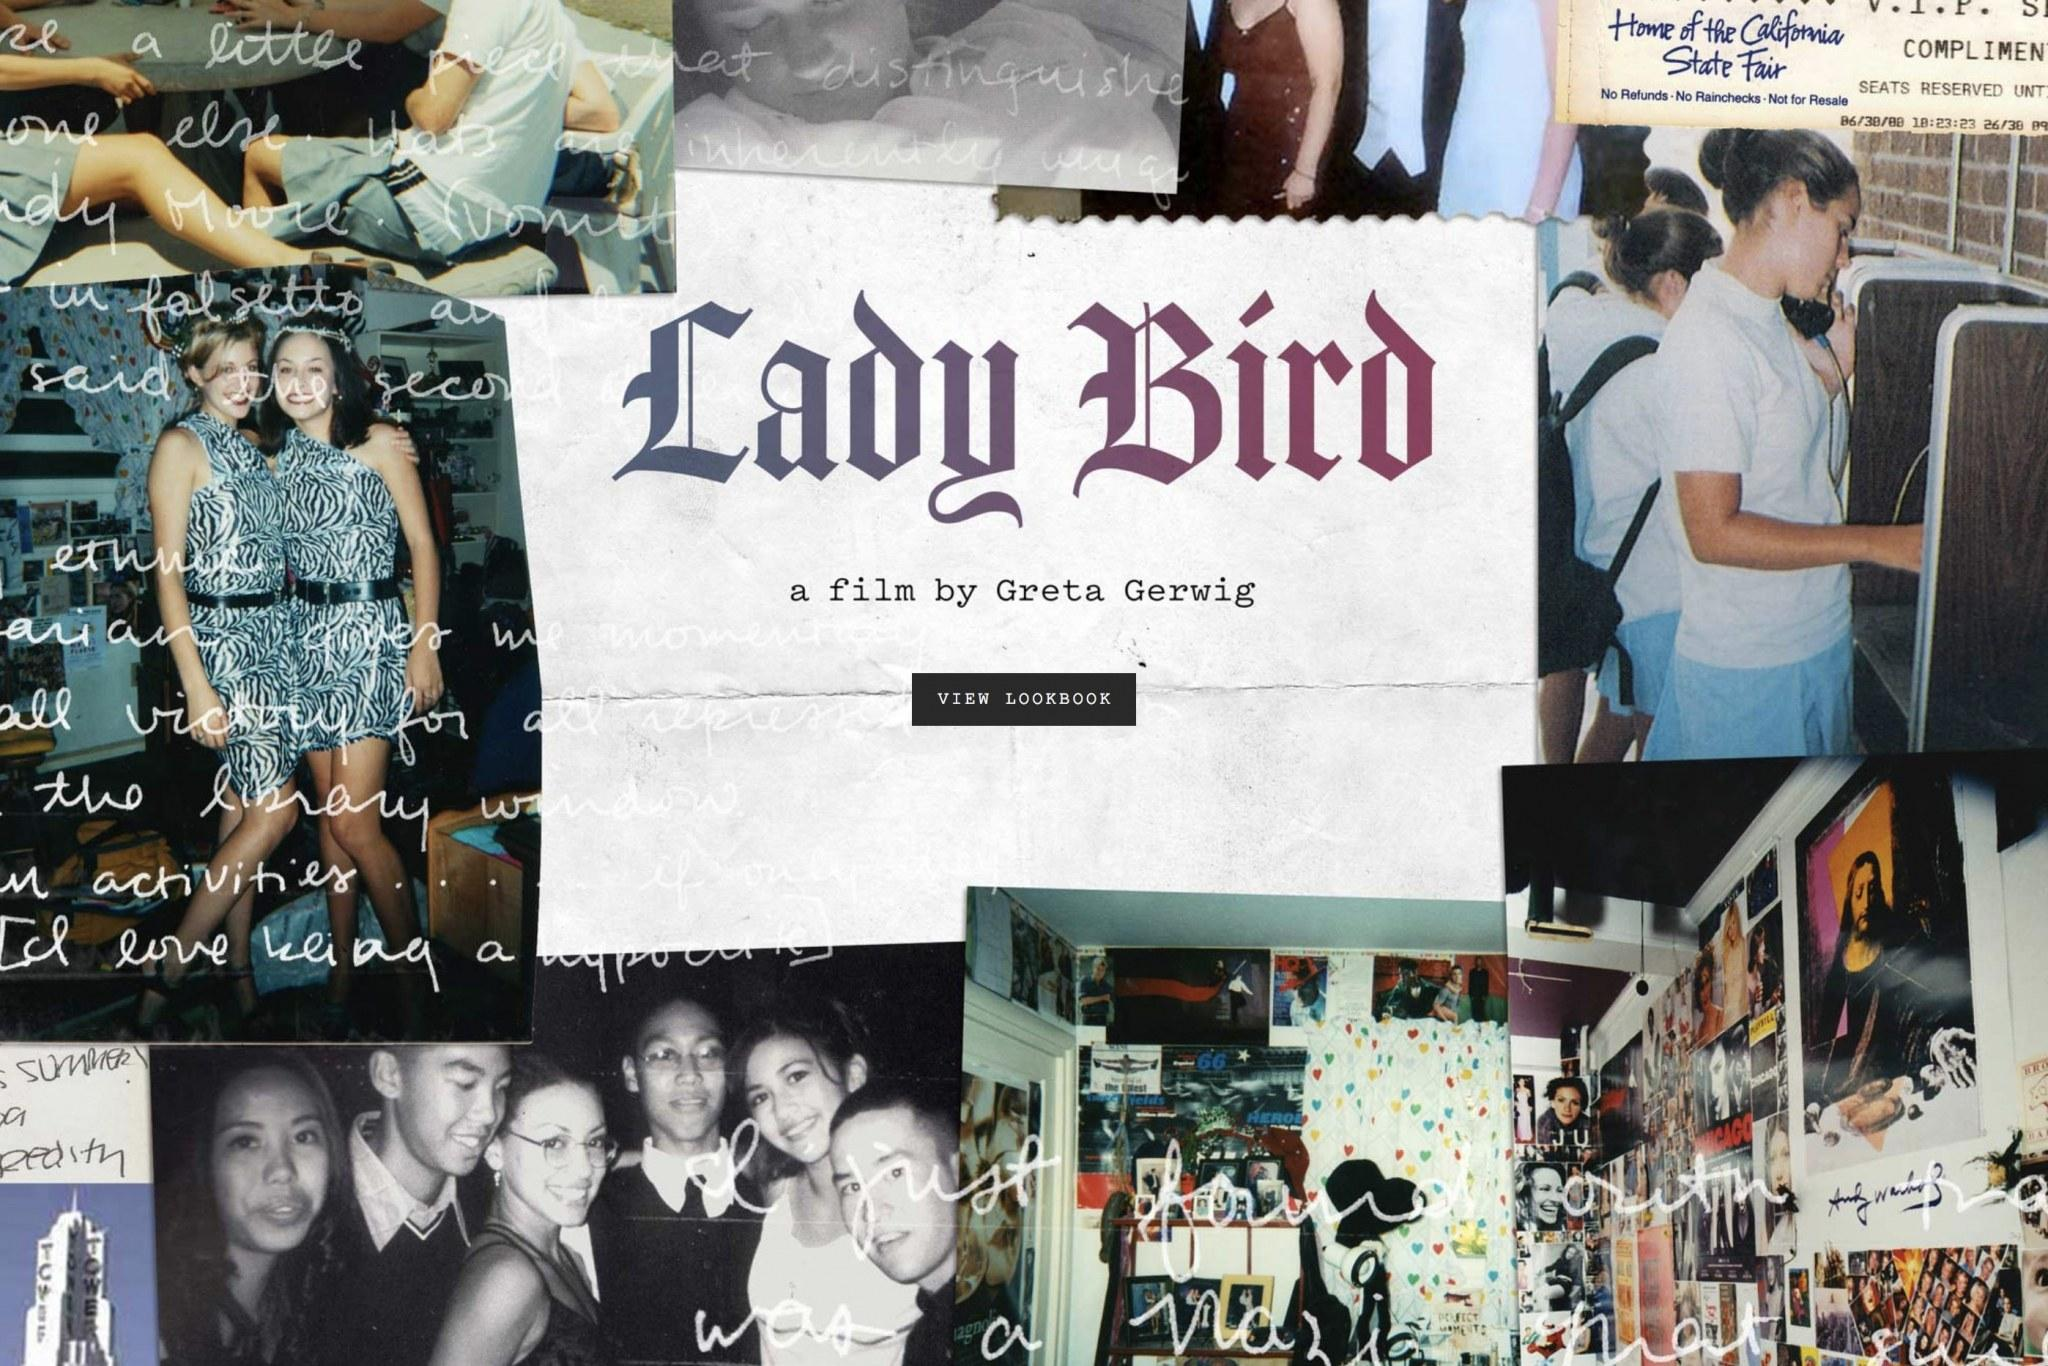 Lady Bird Chips